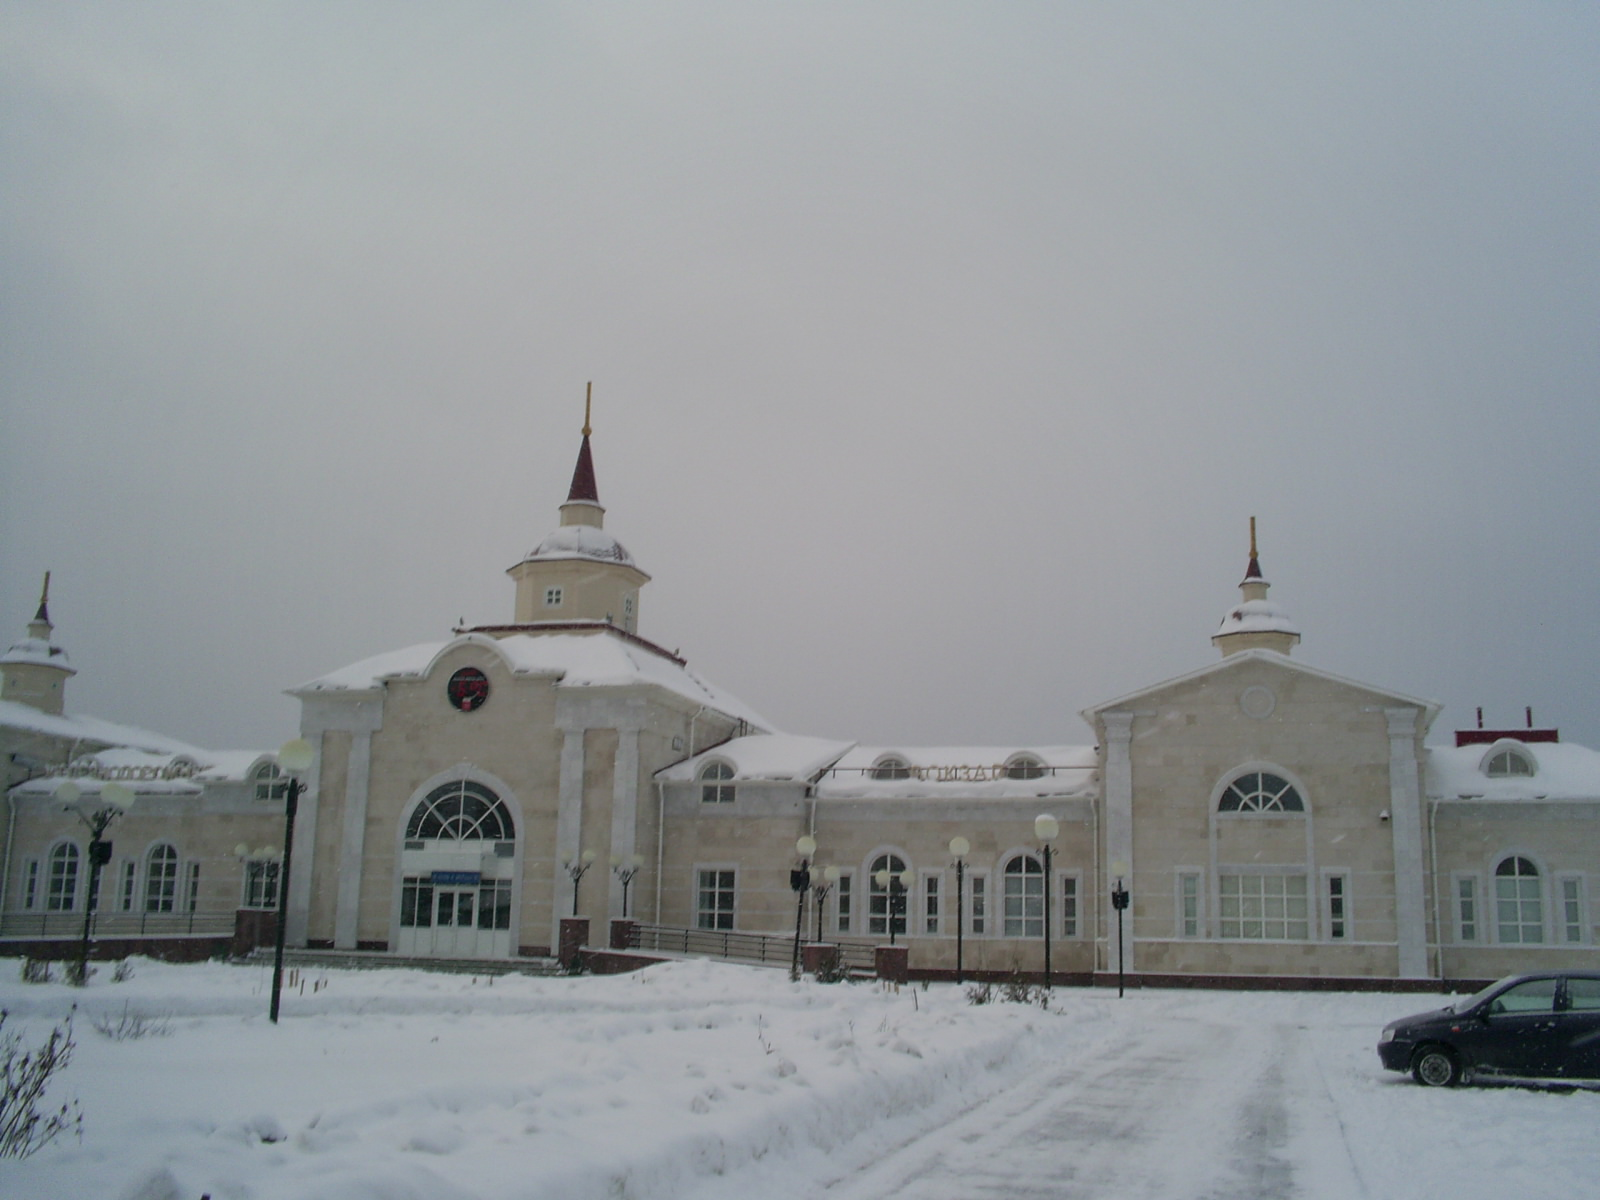 Железнодорожный вокзал шумерля картинки